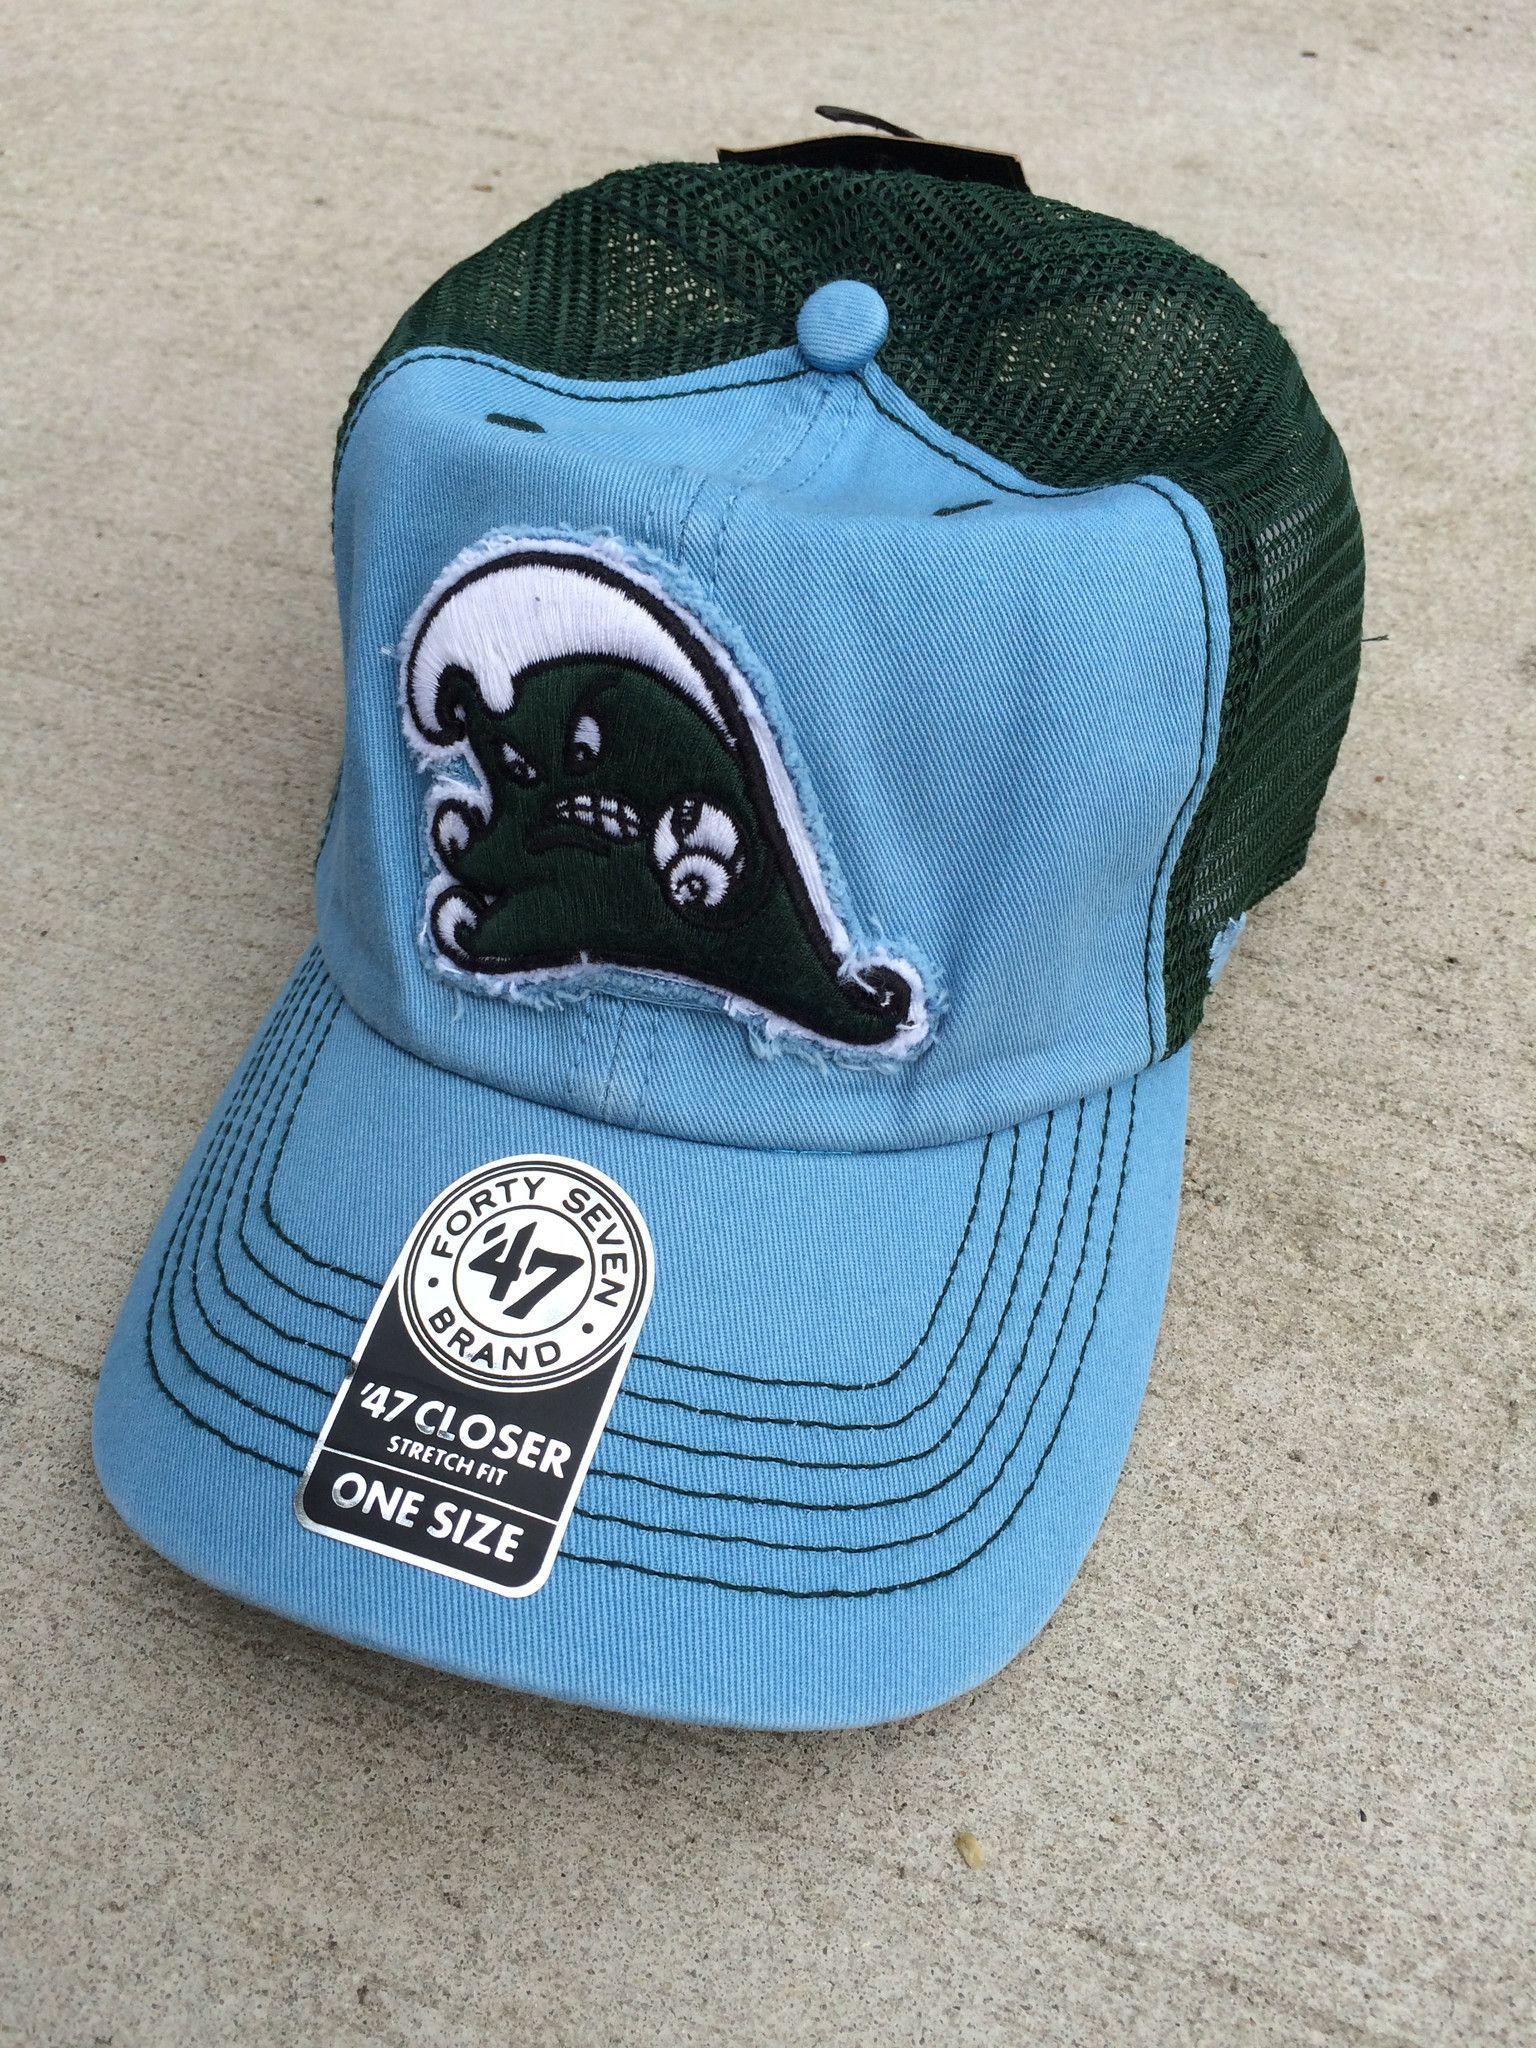 4c93a3c9ad30c Tulane Gumby Mesh Trucker Hat